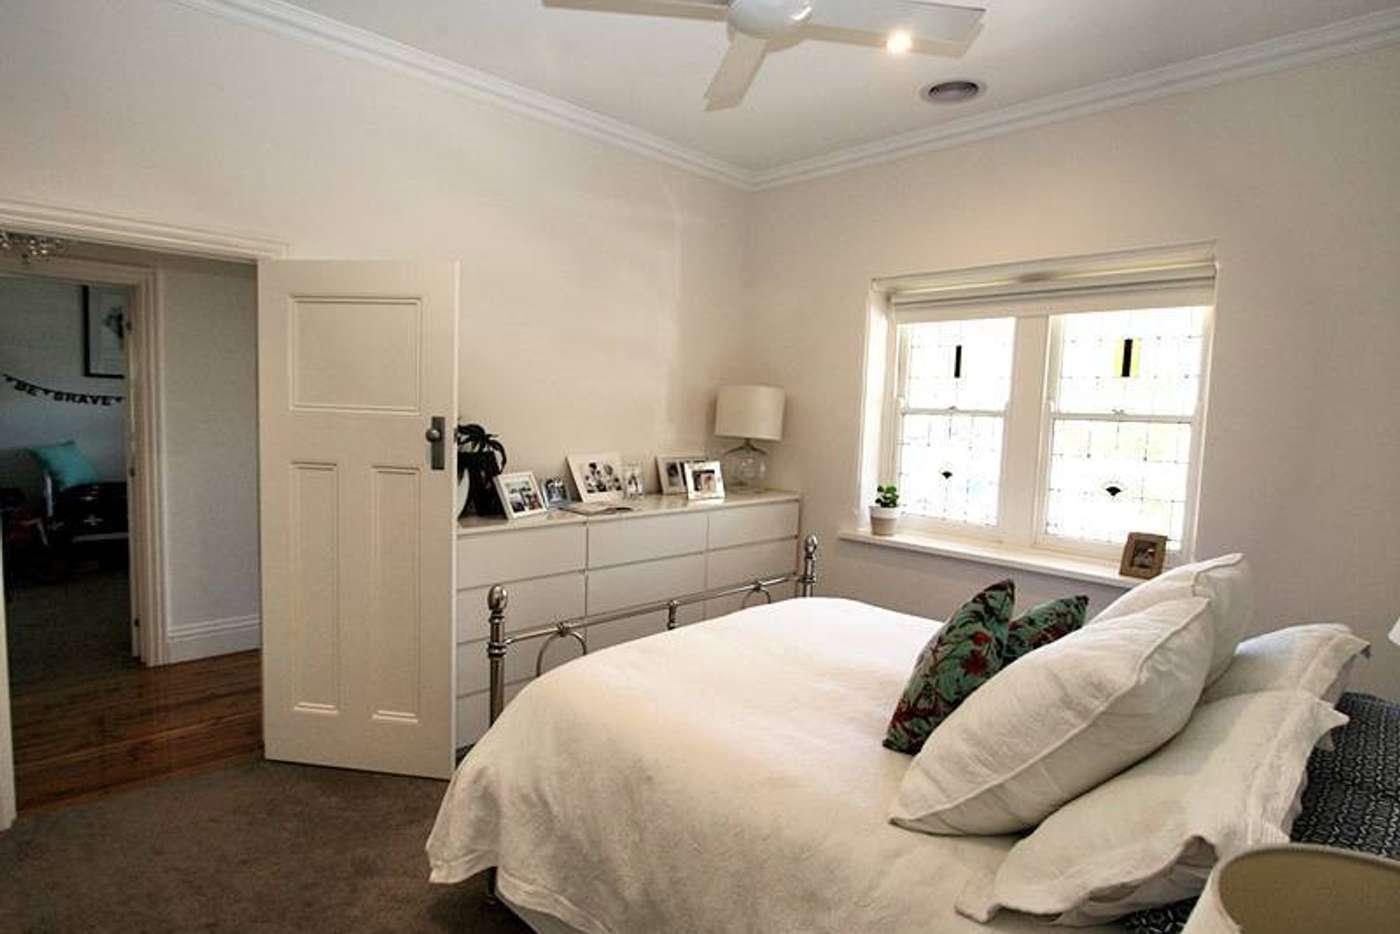 Sixth view of Homely house listing, 40 Brookong Avenue, Wagga Wagga NSW 2650